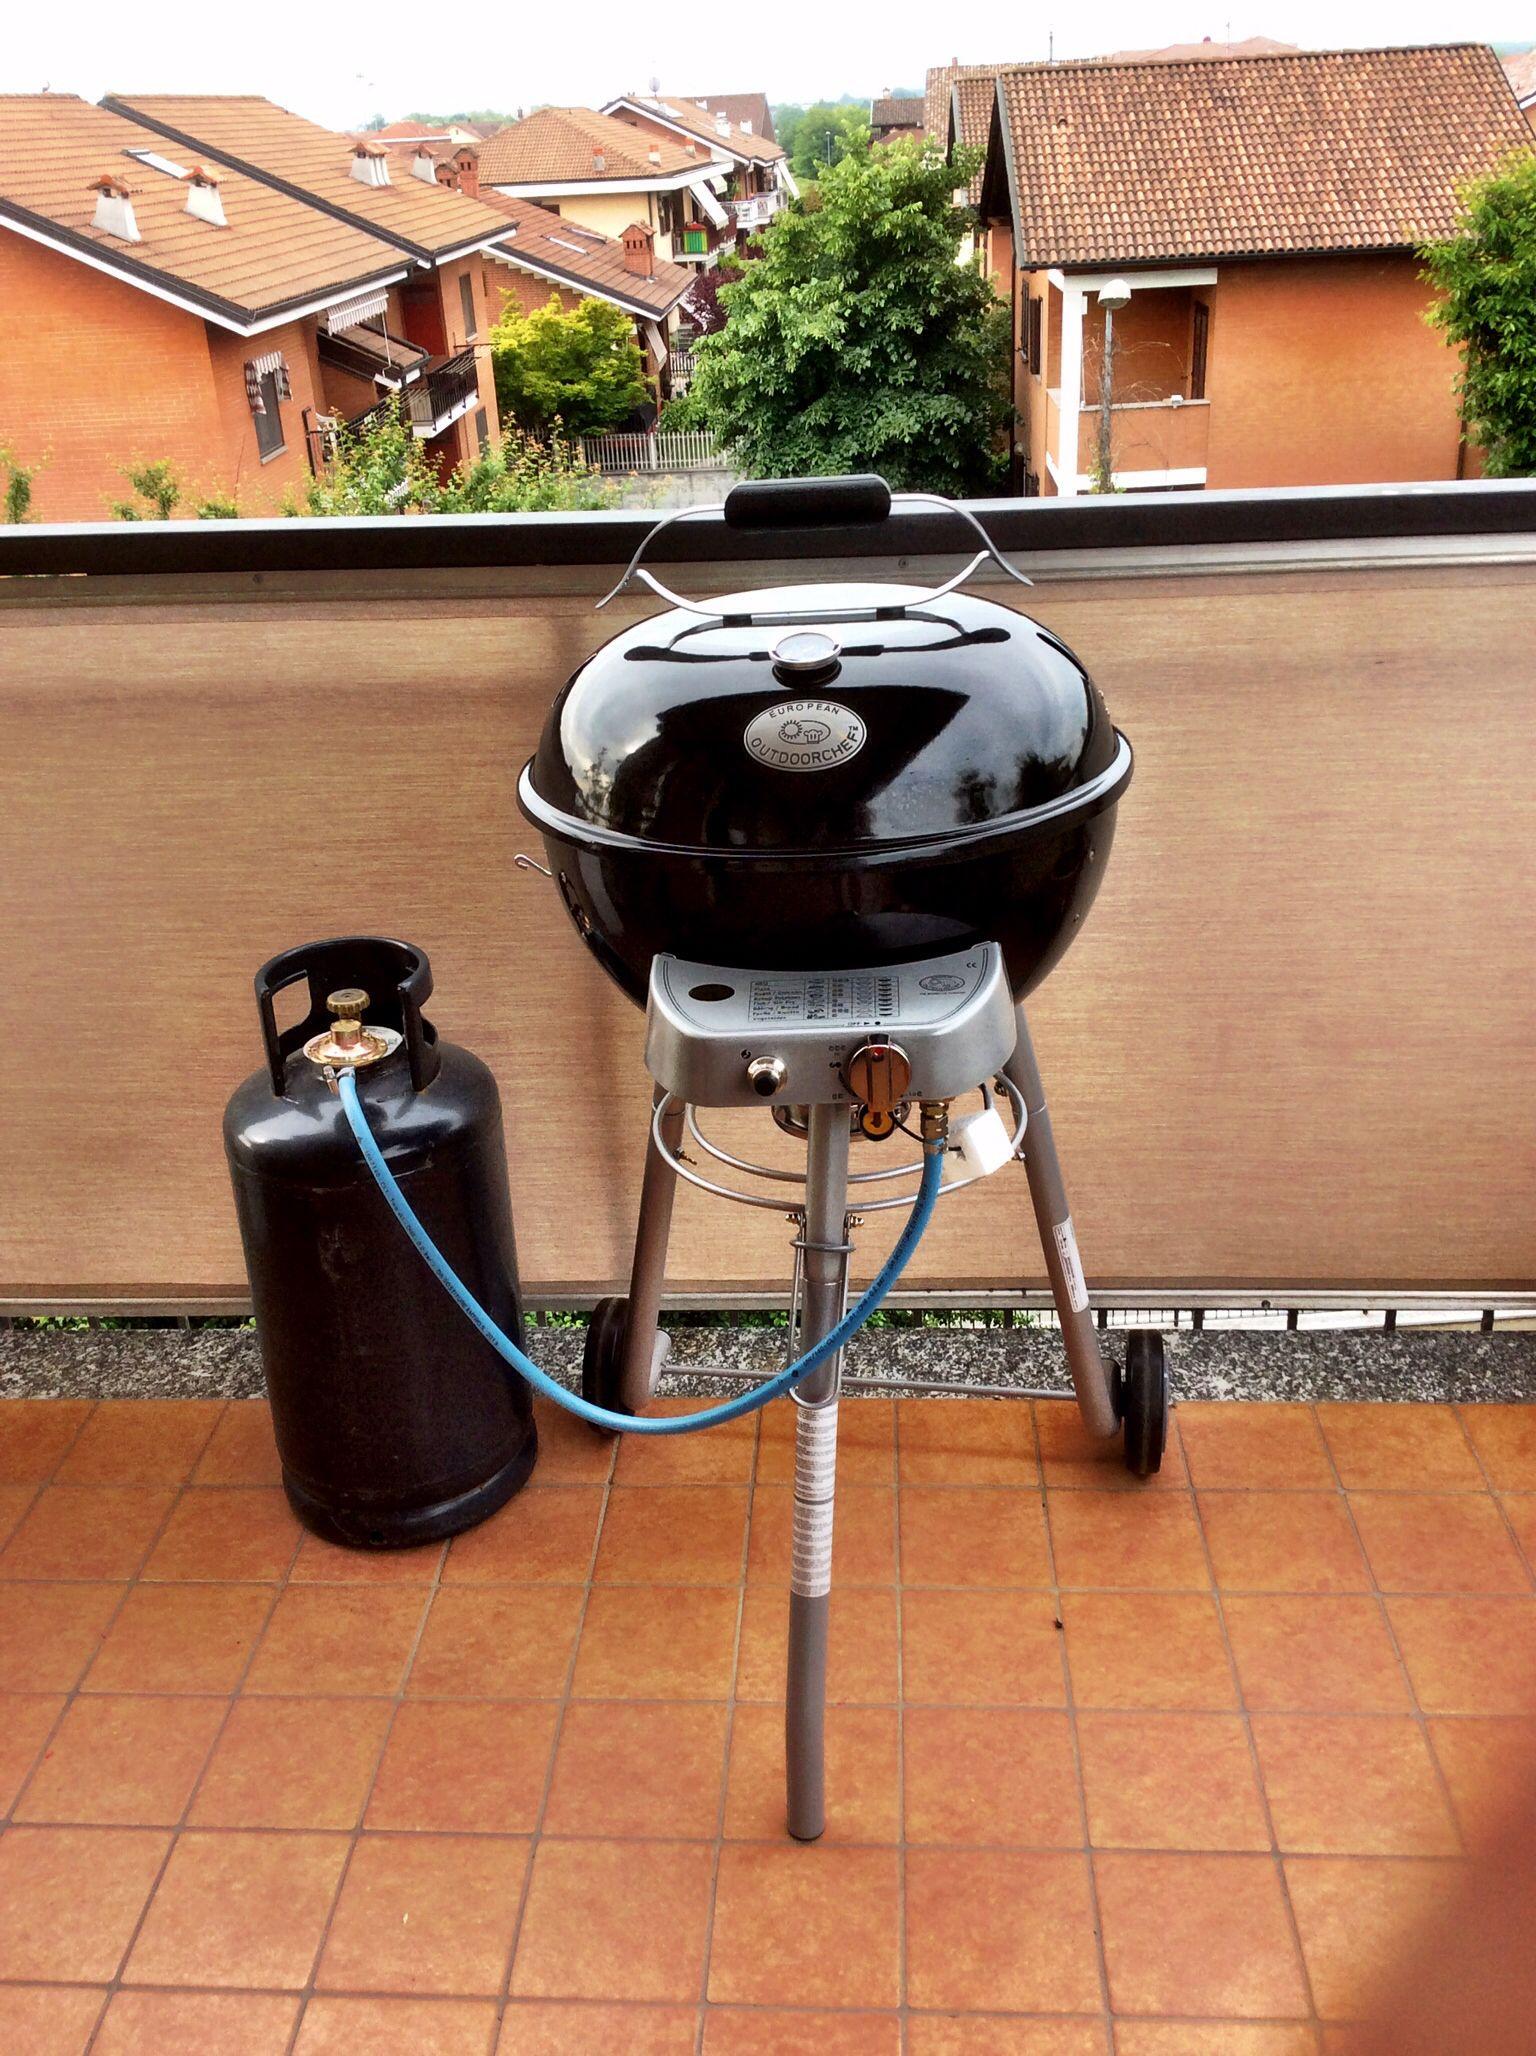 Balcon Barbecue